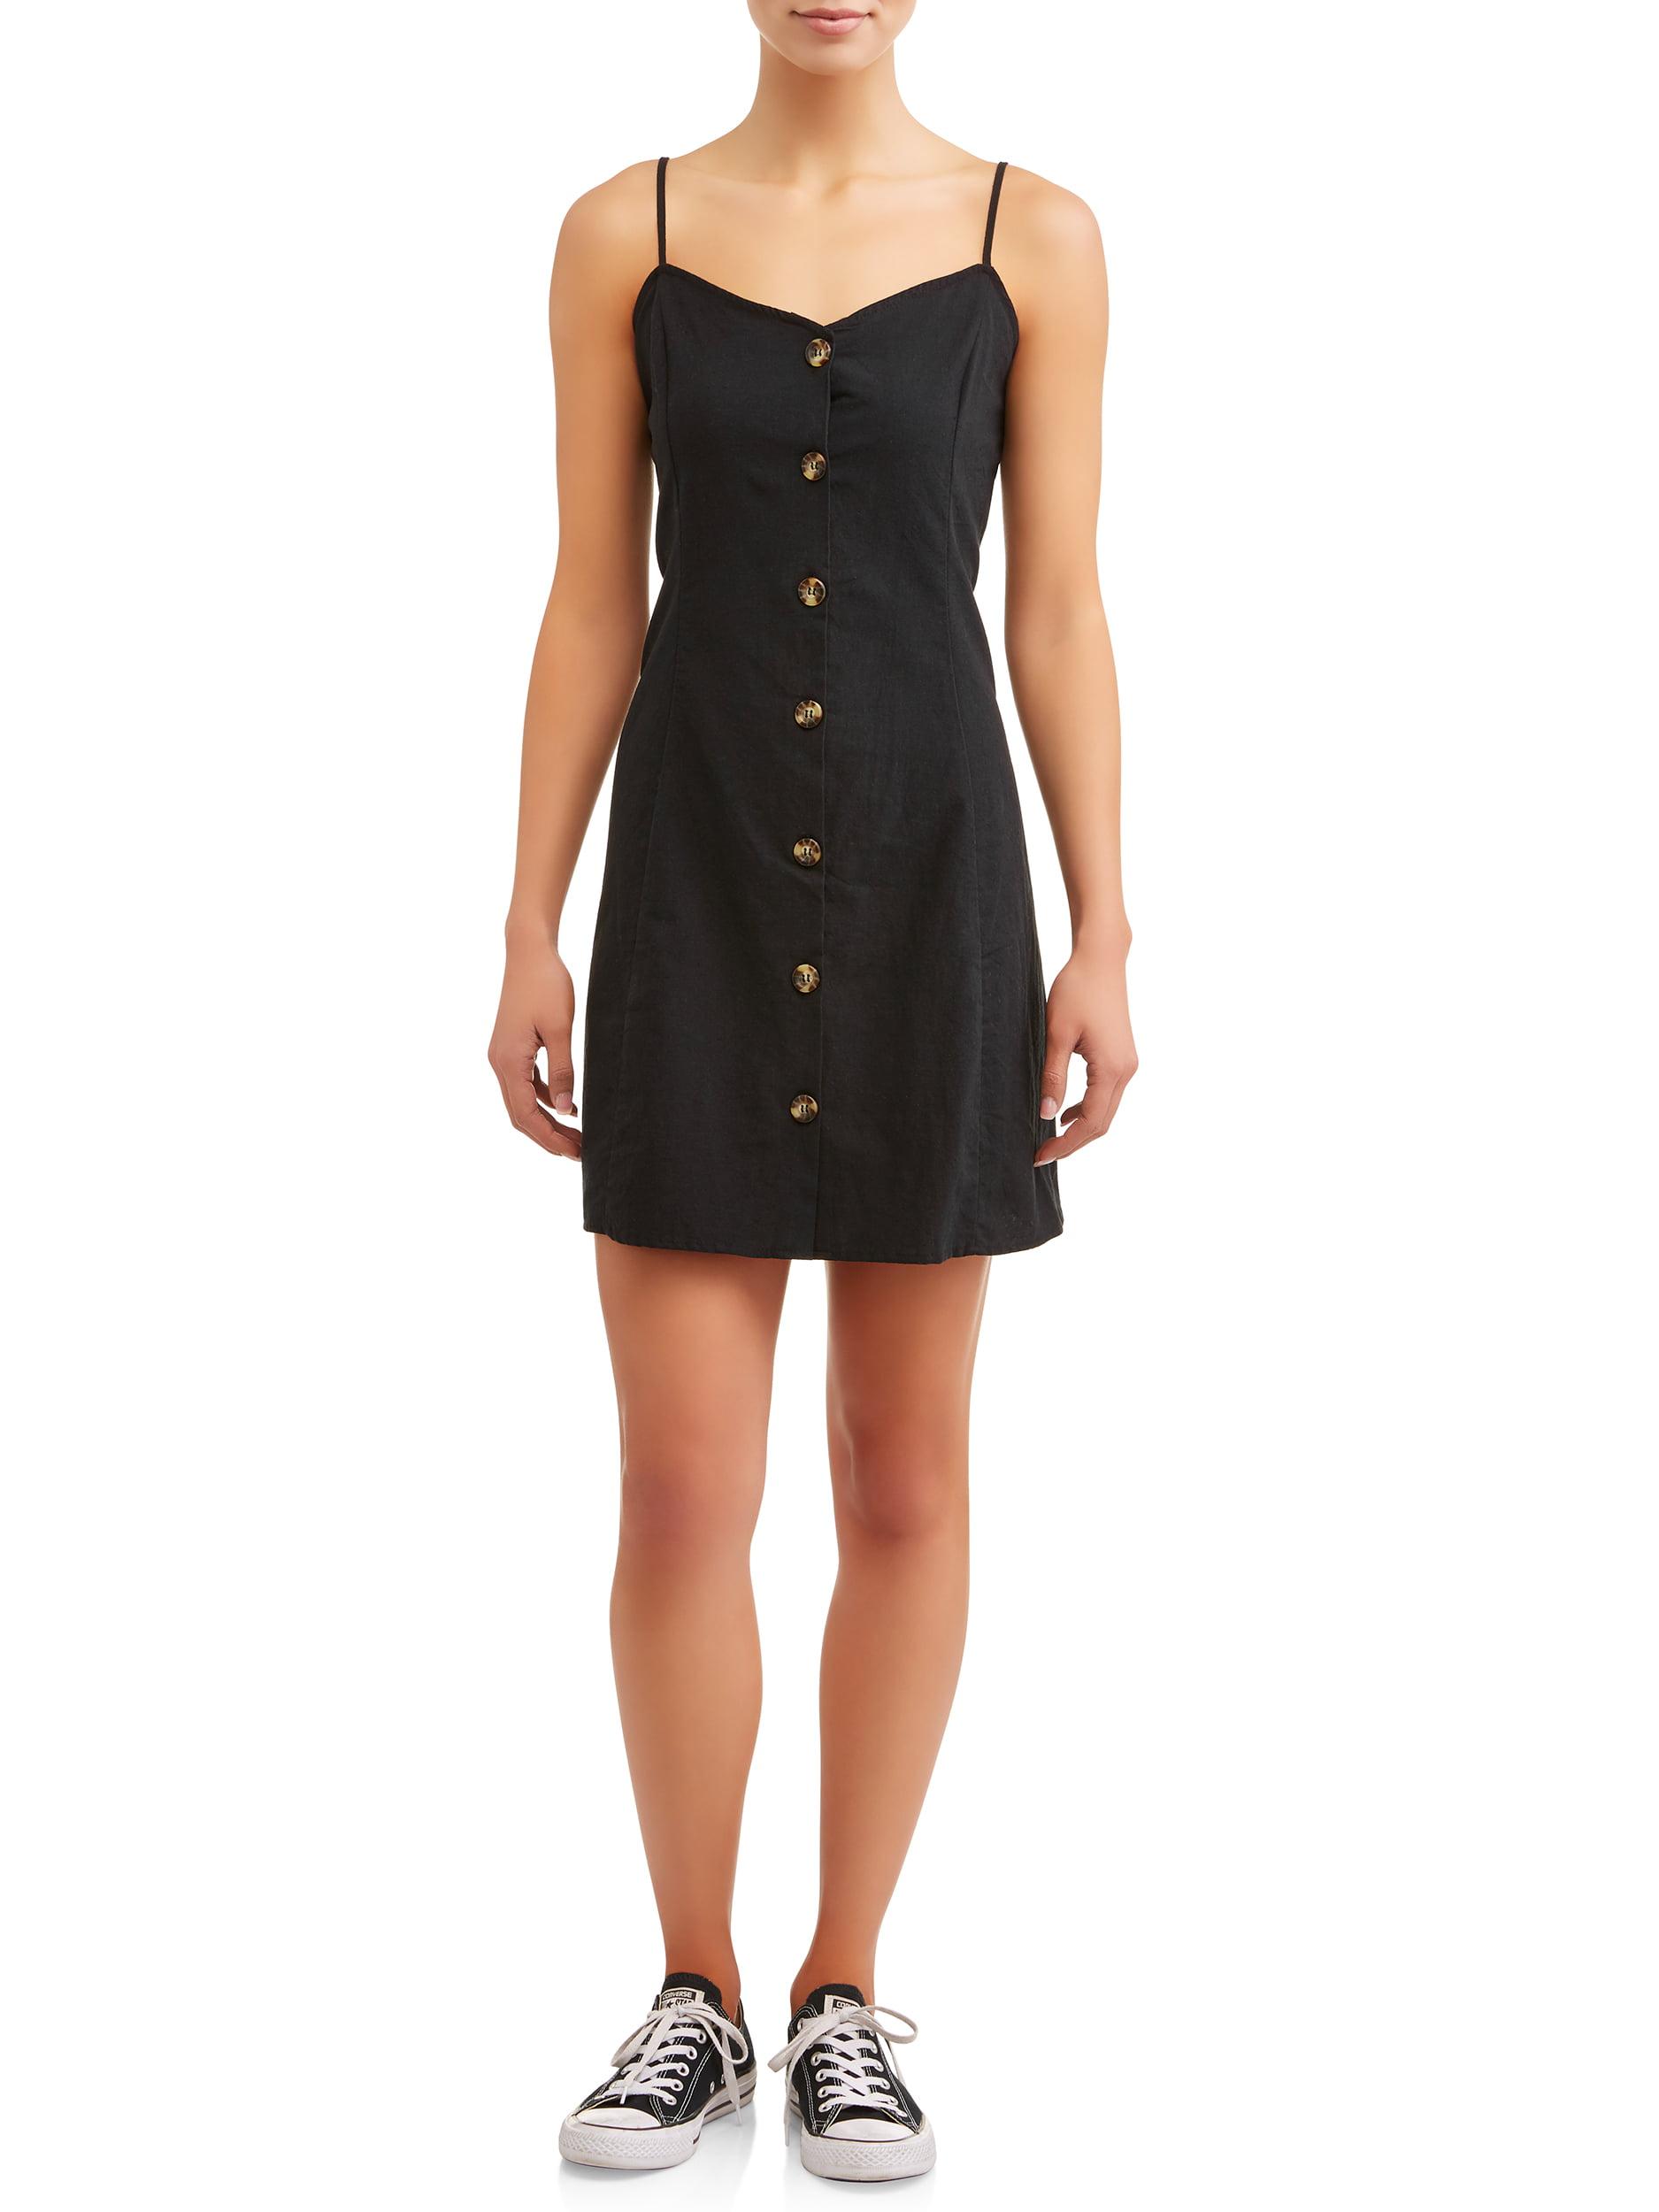 Juniors' Button Front Cami Dress with Princess Seams